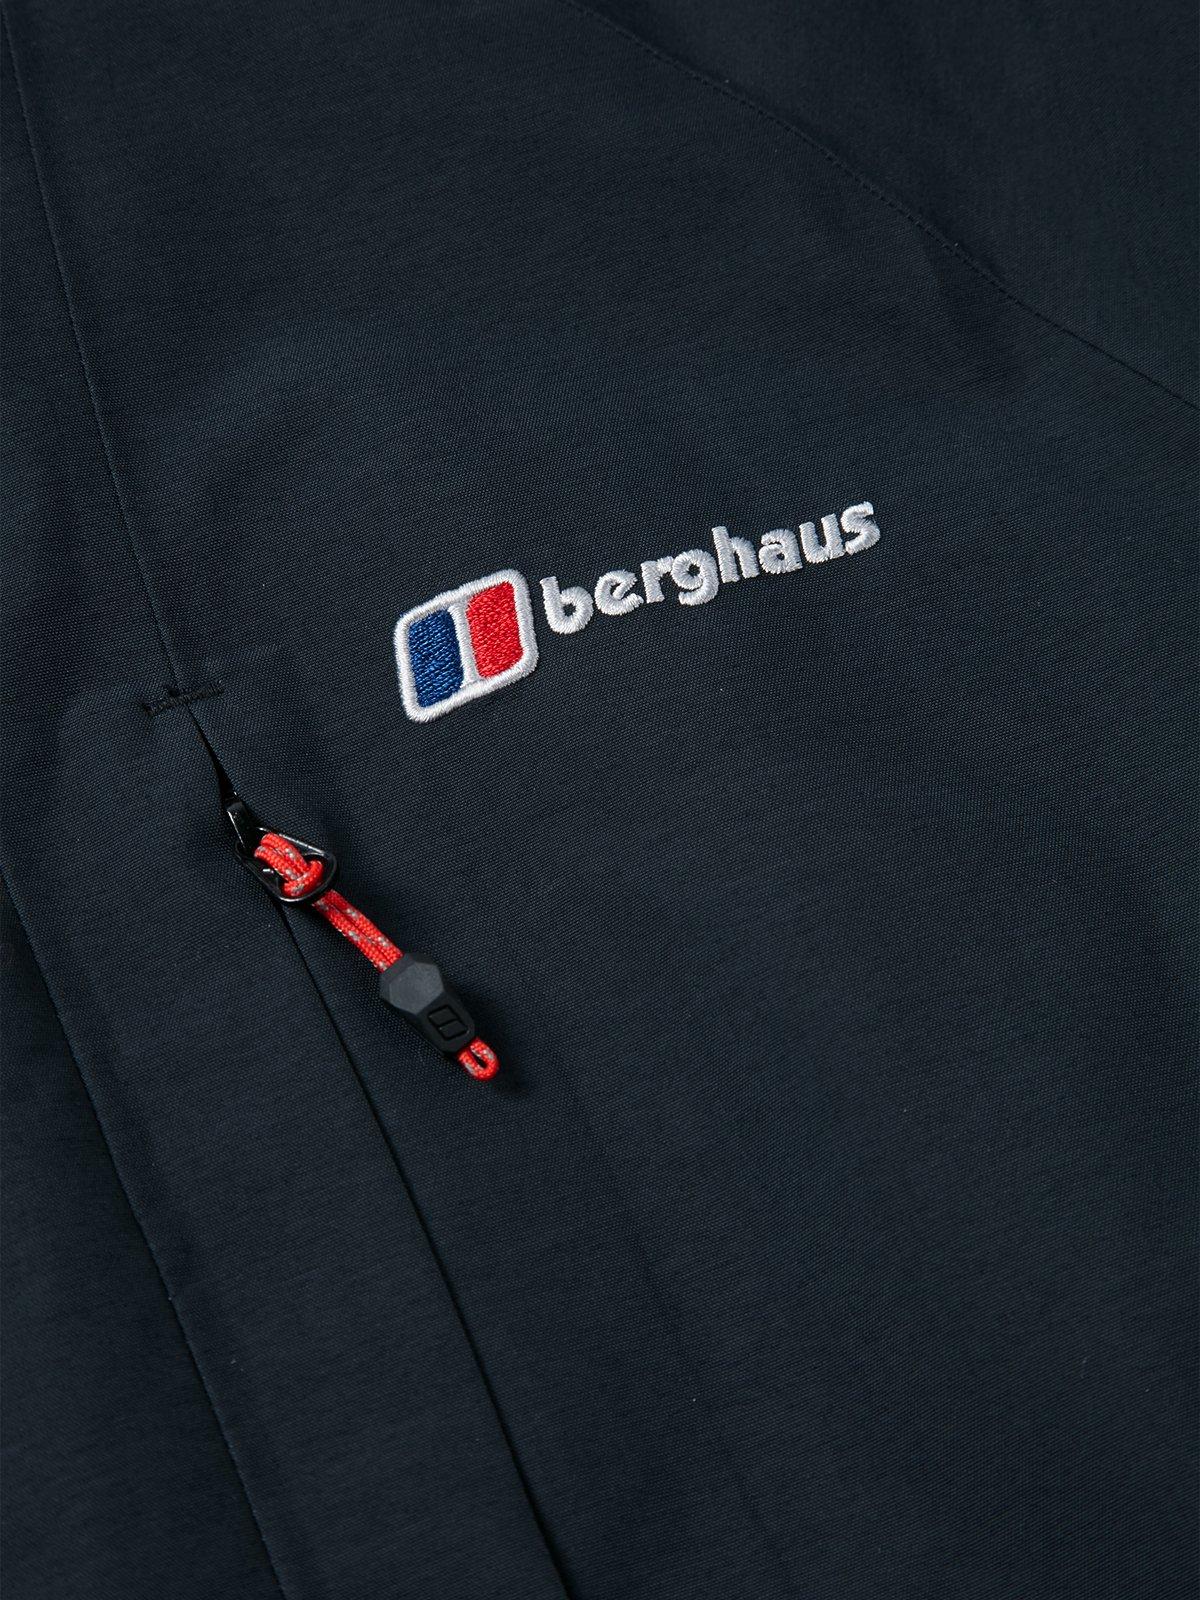 81U6fLzMMNL - Berghaus Women's Hillmaster Gore-tex Waterproof Jacket